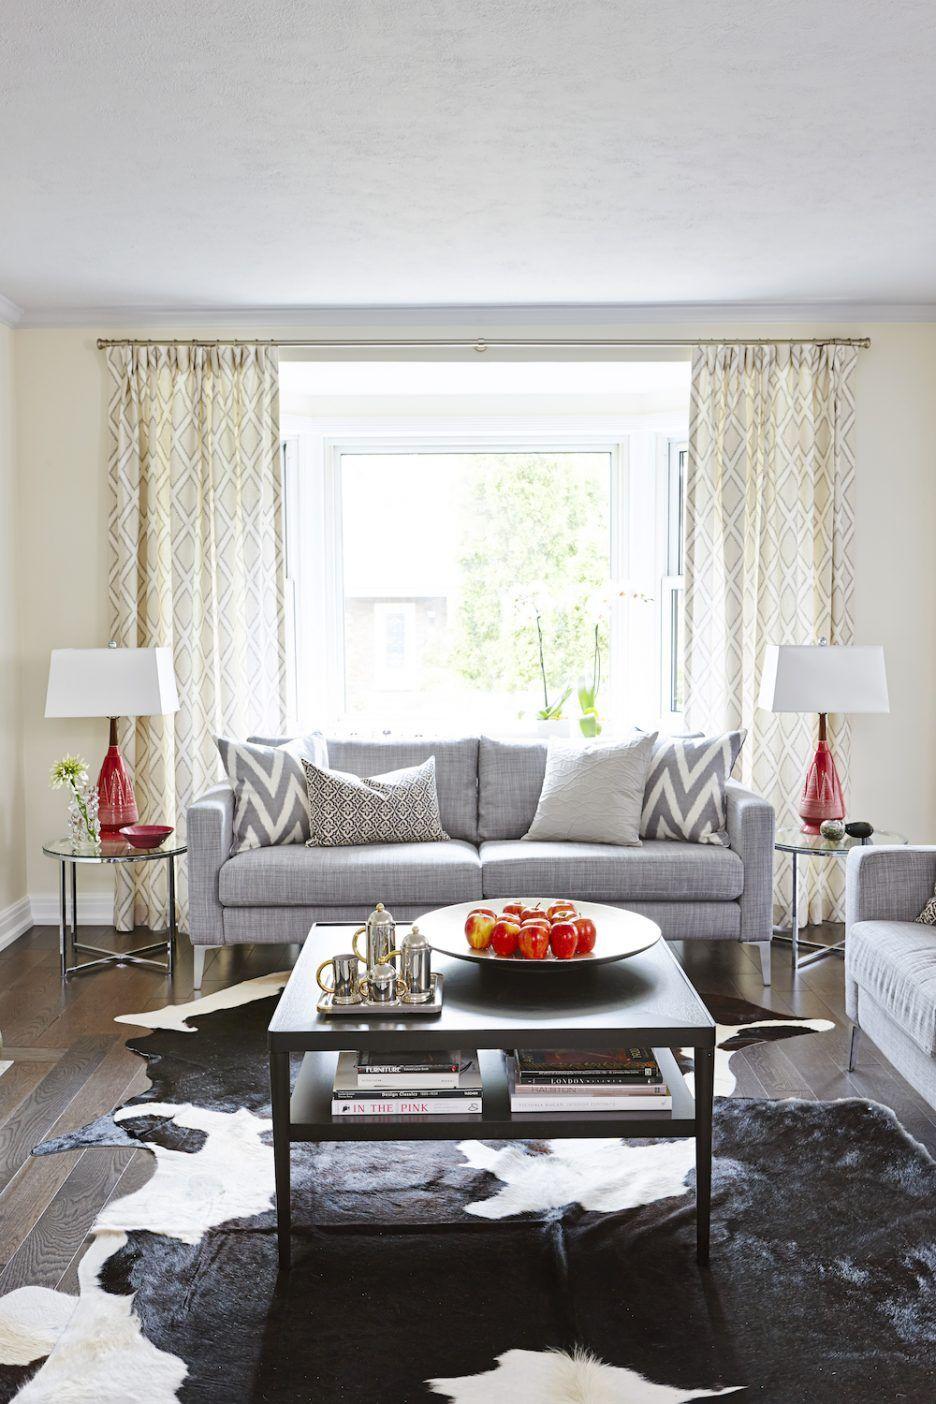 15 Unique Bonus Room Ideas and Designs for Your Home | Pinterest ...